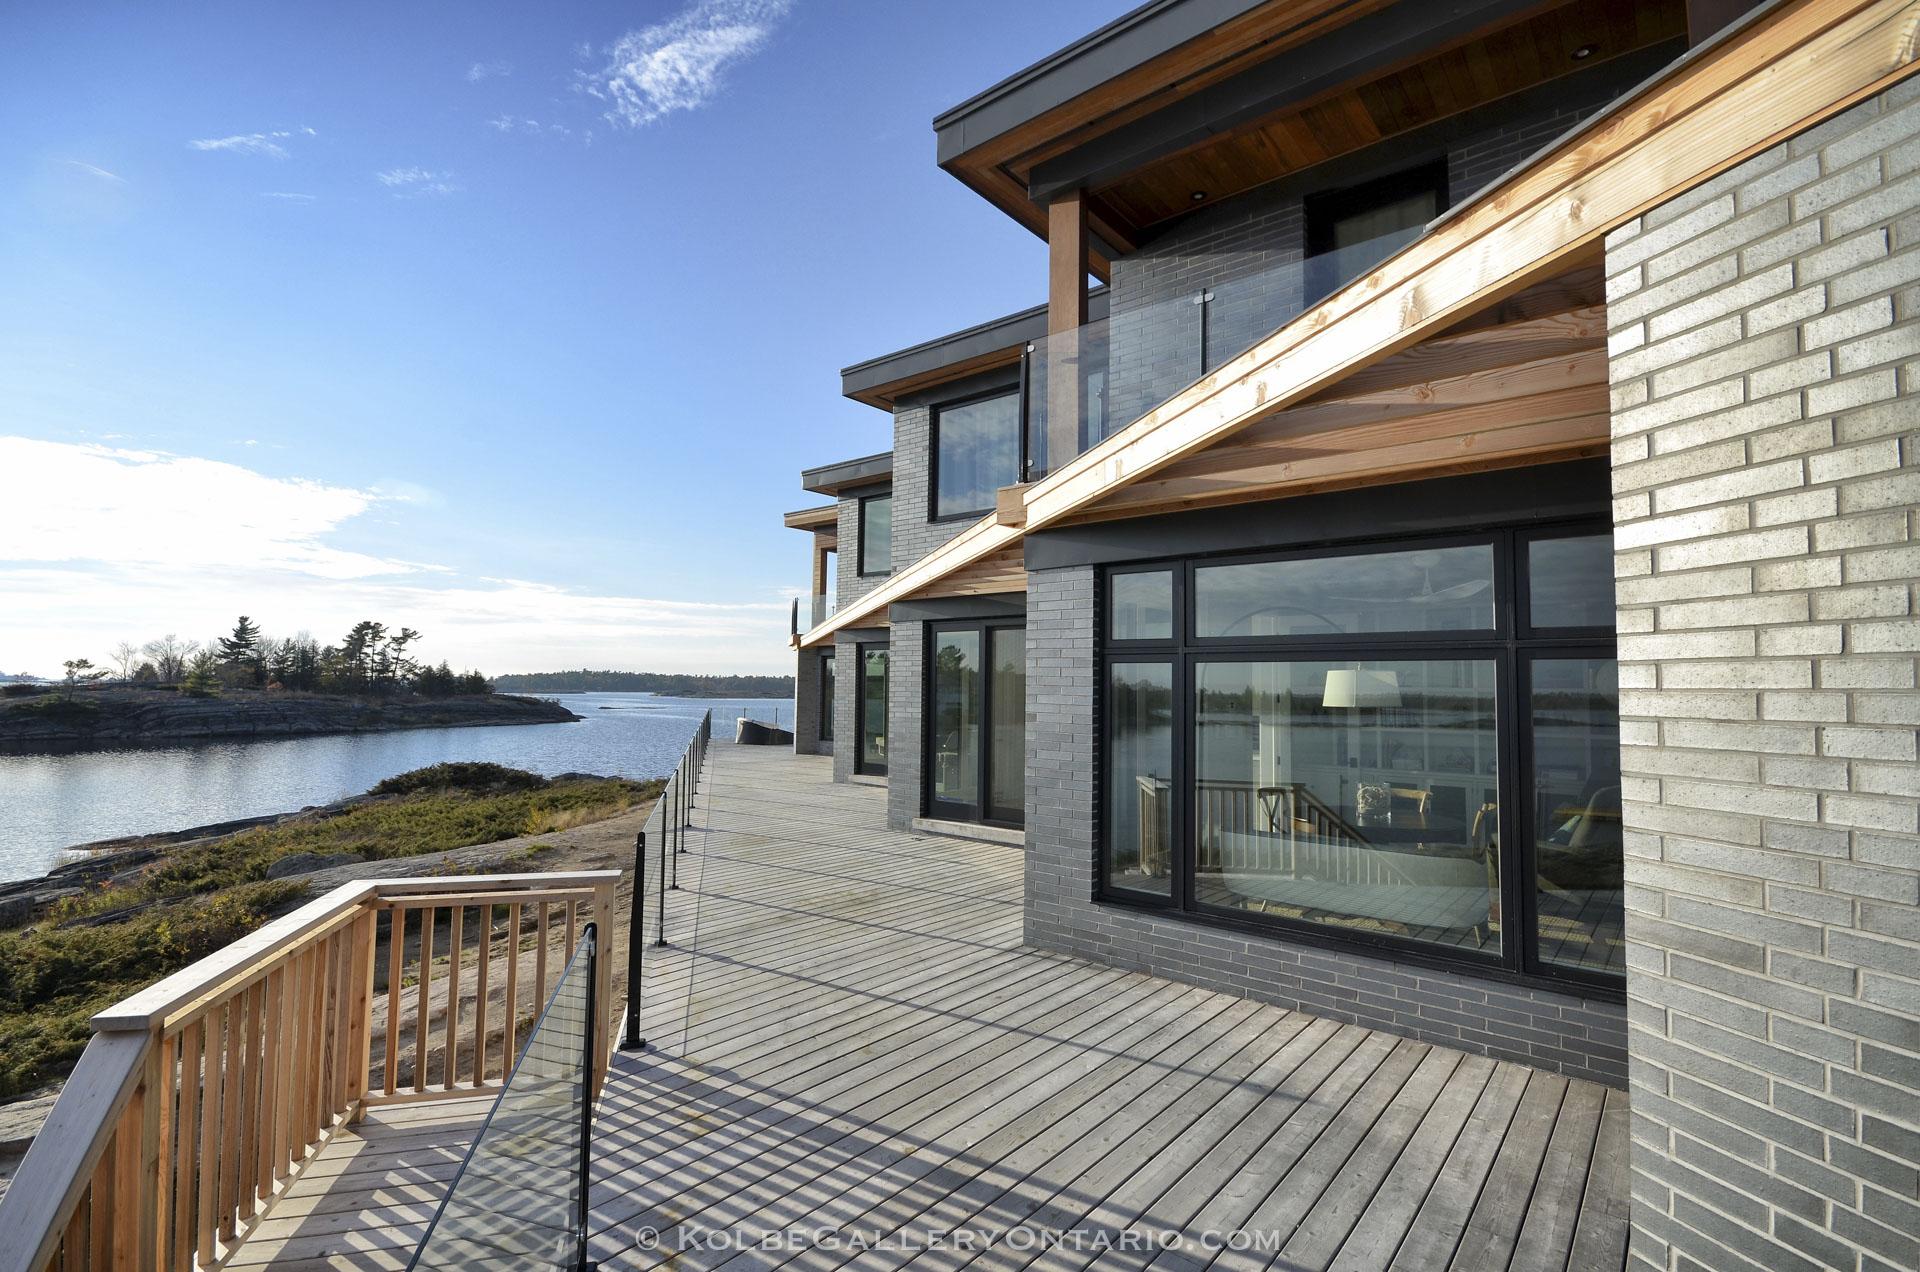 KolbeGalleryOntario.ca-windows-and-doors-20141024-170554-10